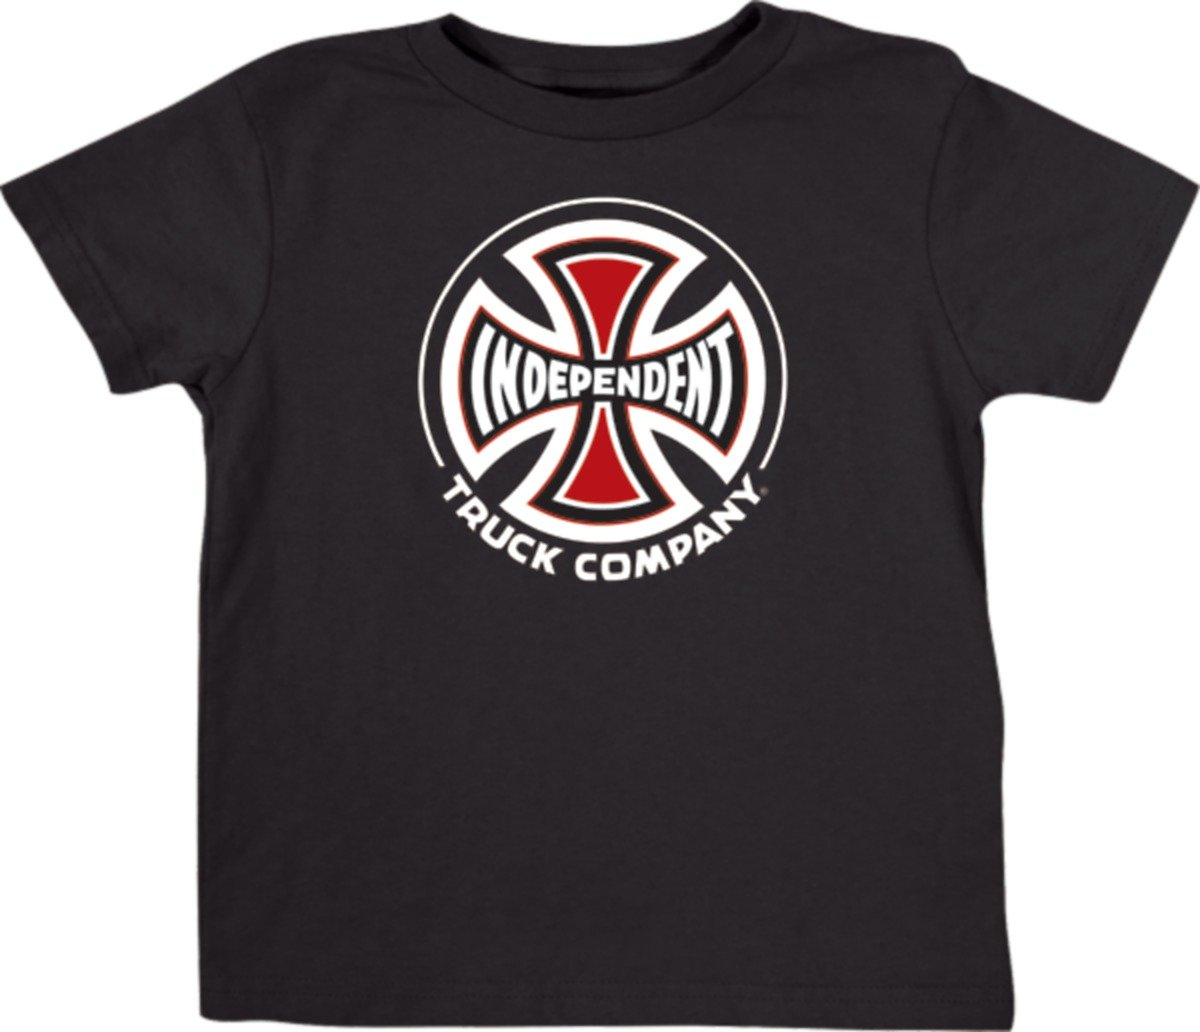 Independent Truck Co Black 3 Toddler Toddler T-Shirt